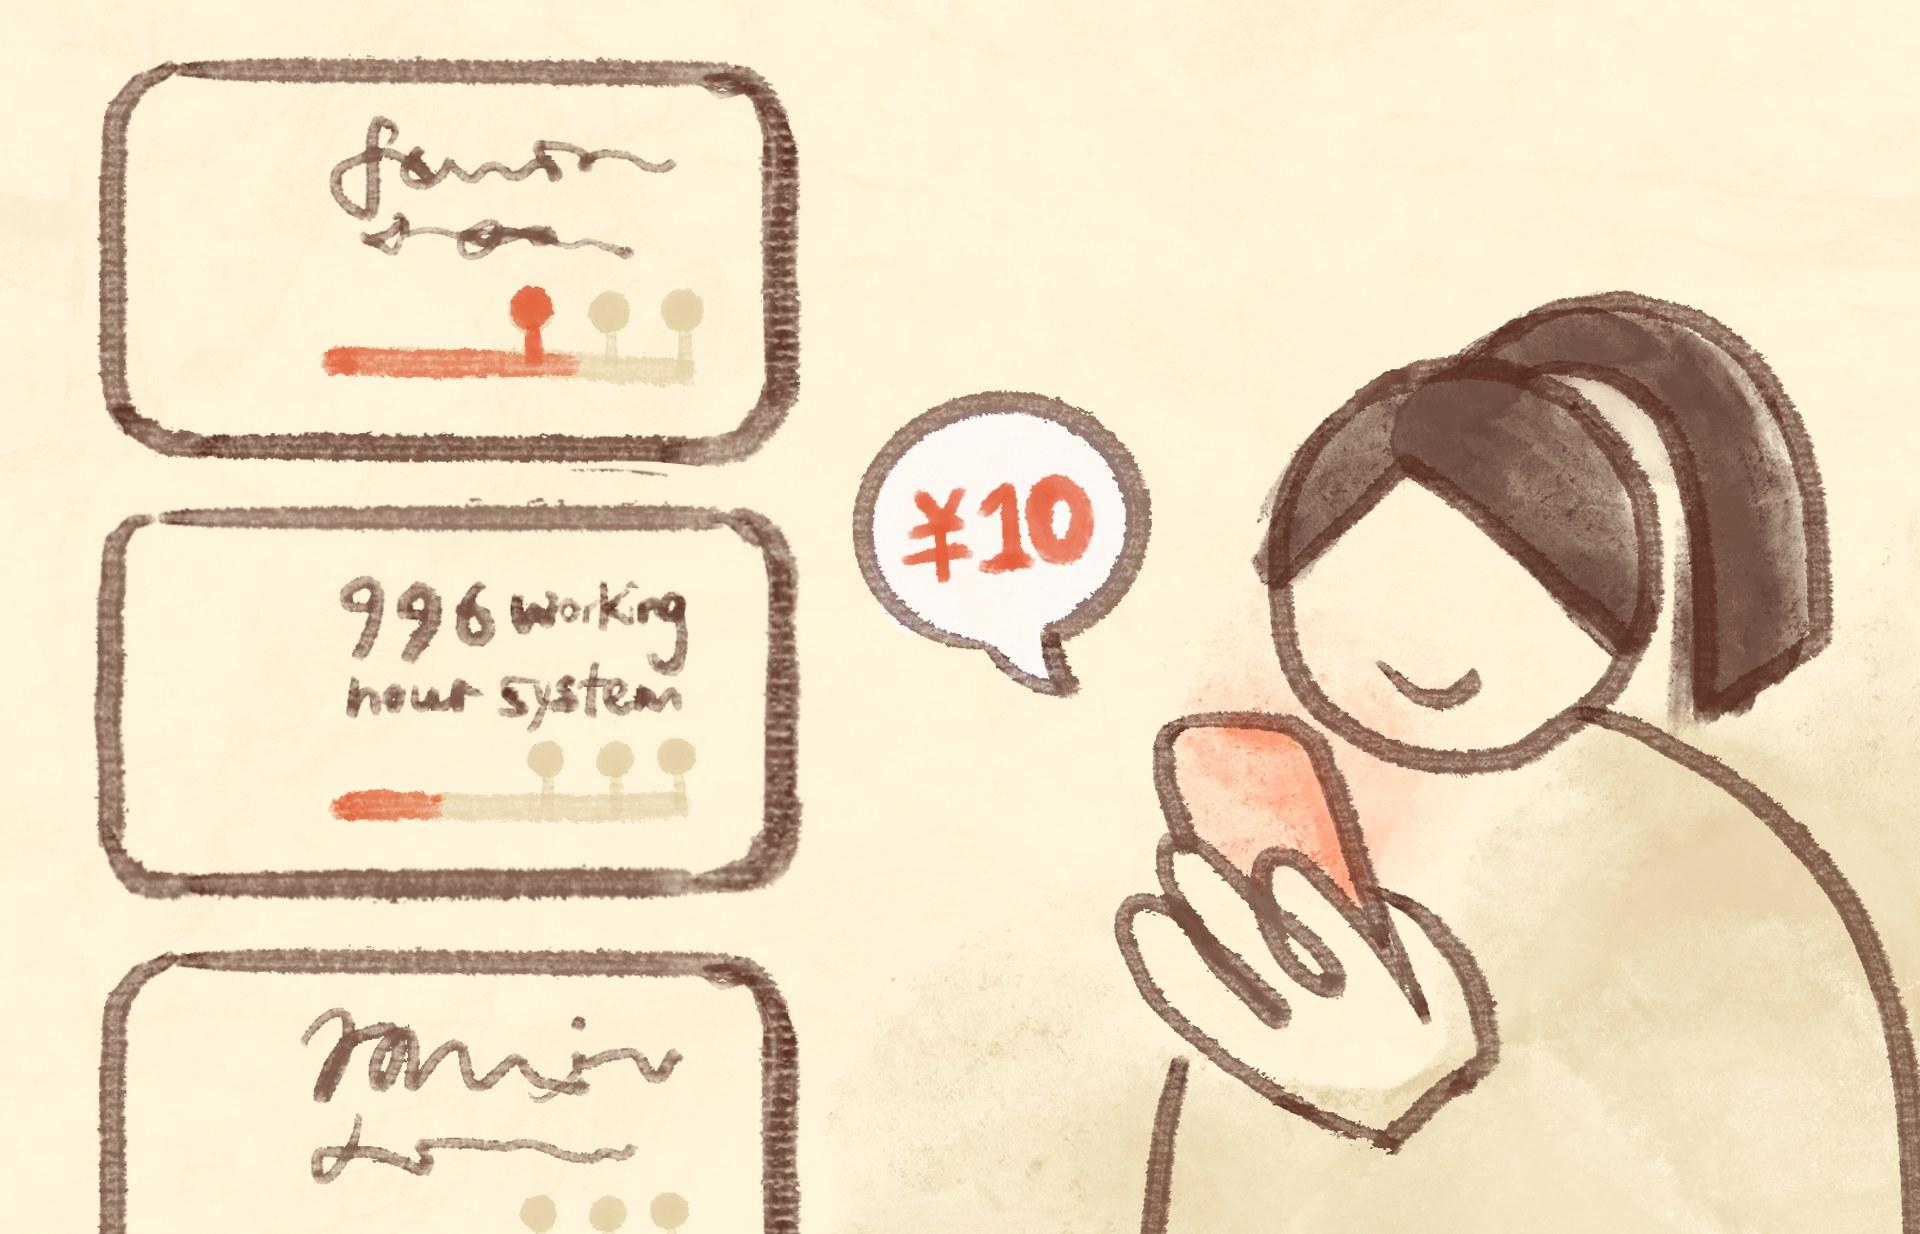 Service Flow - Crowdfunding